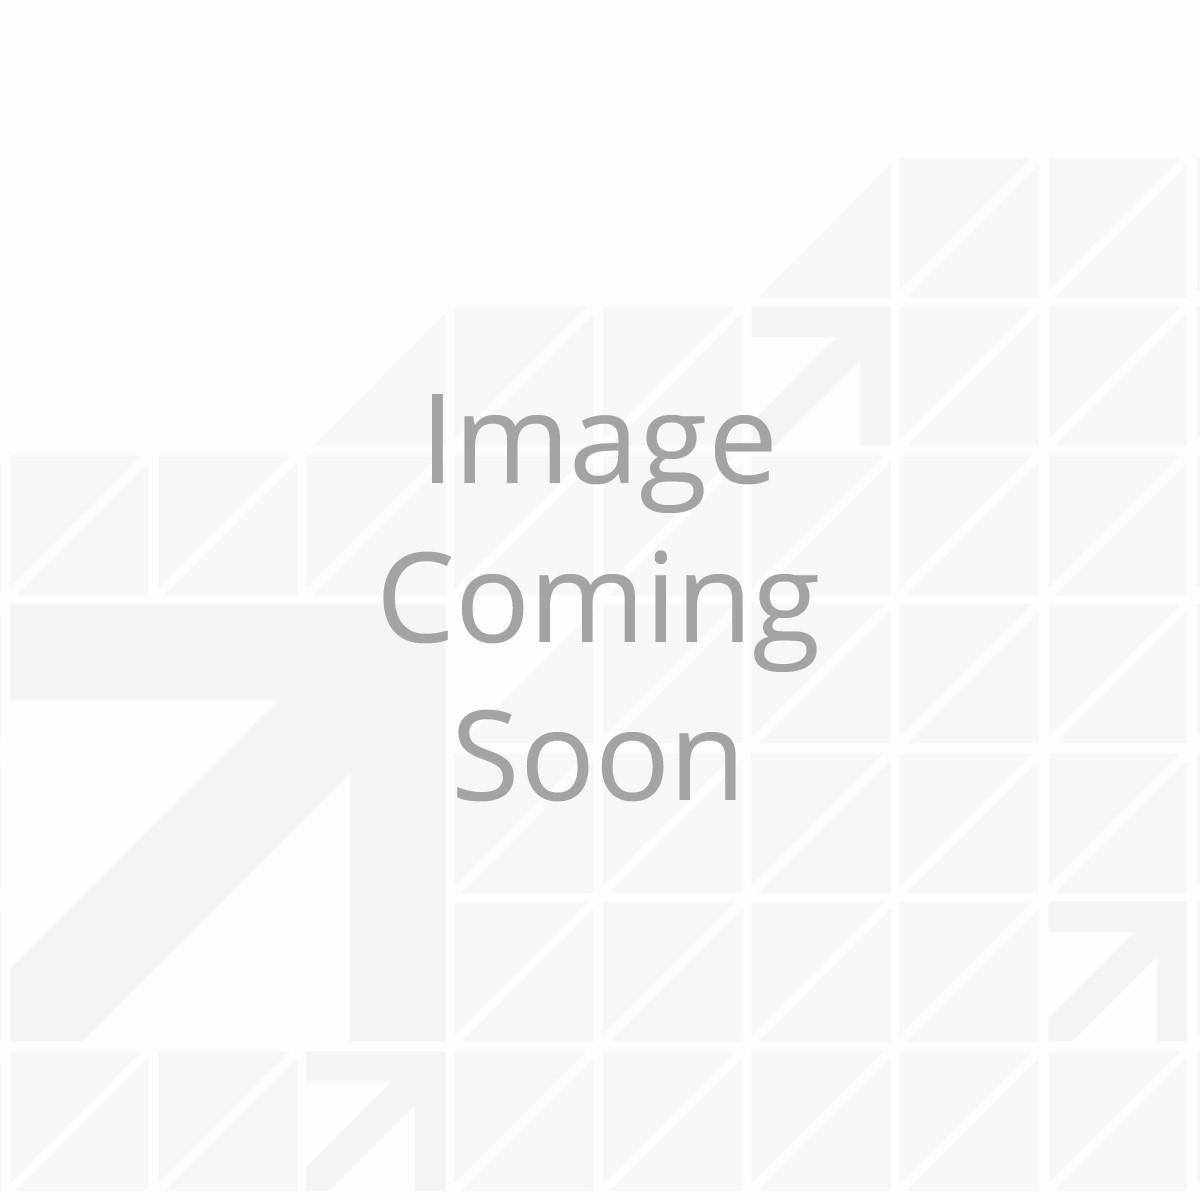 294886_Tab-Kit_001